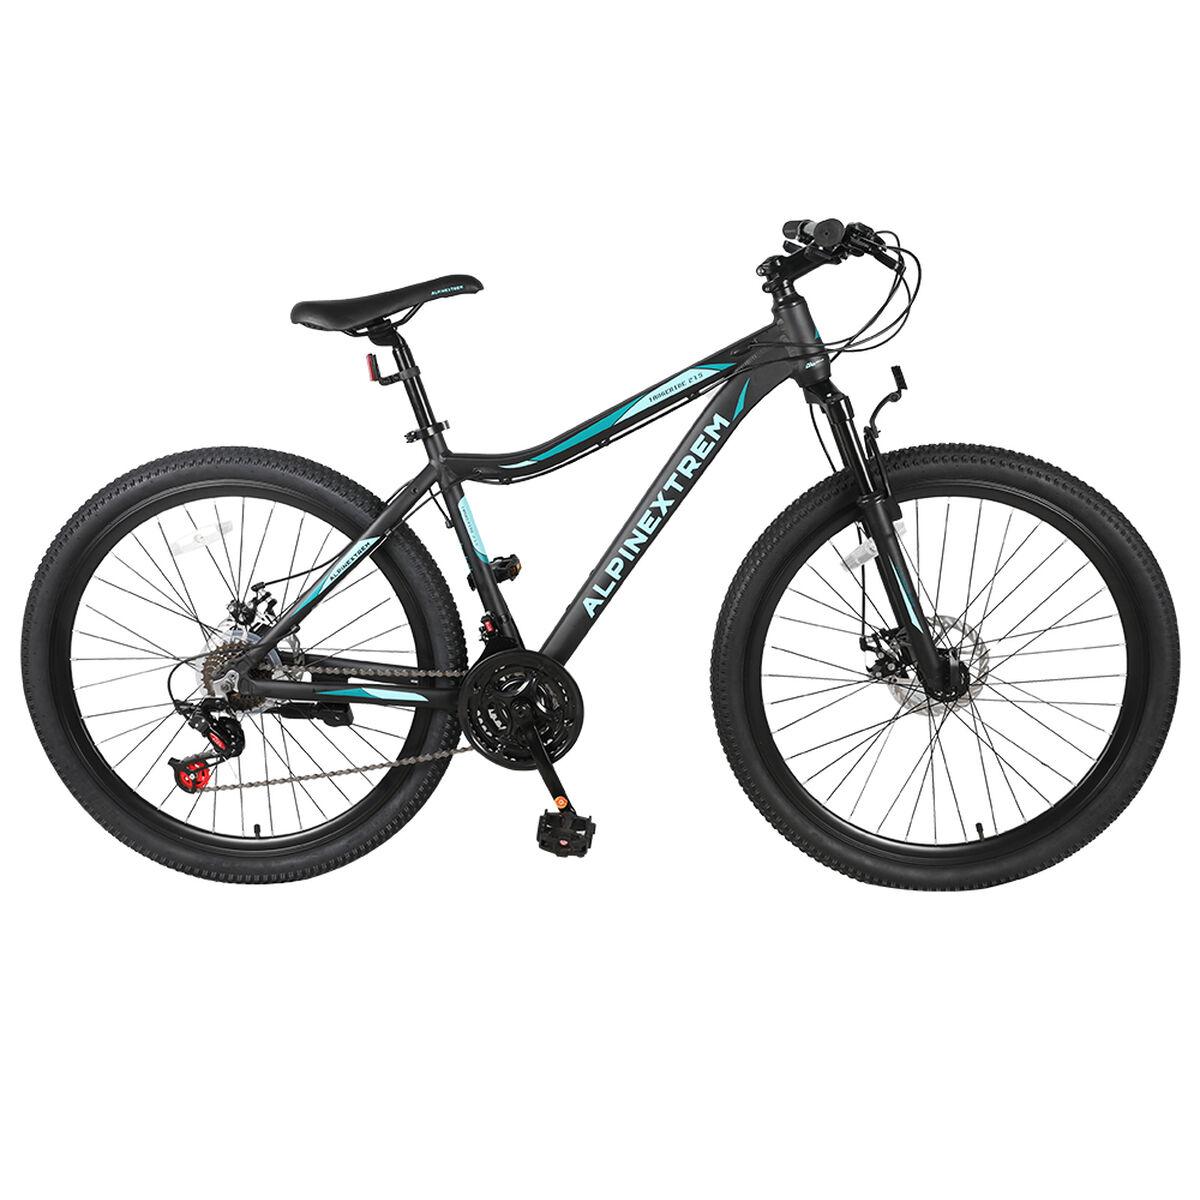 Bicicleta Alpinextrem Tangerine Aro 27,5